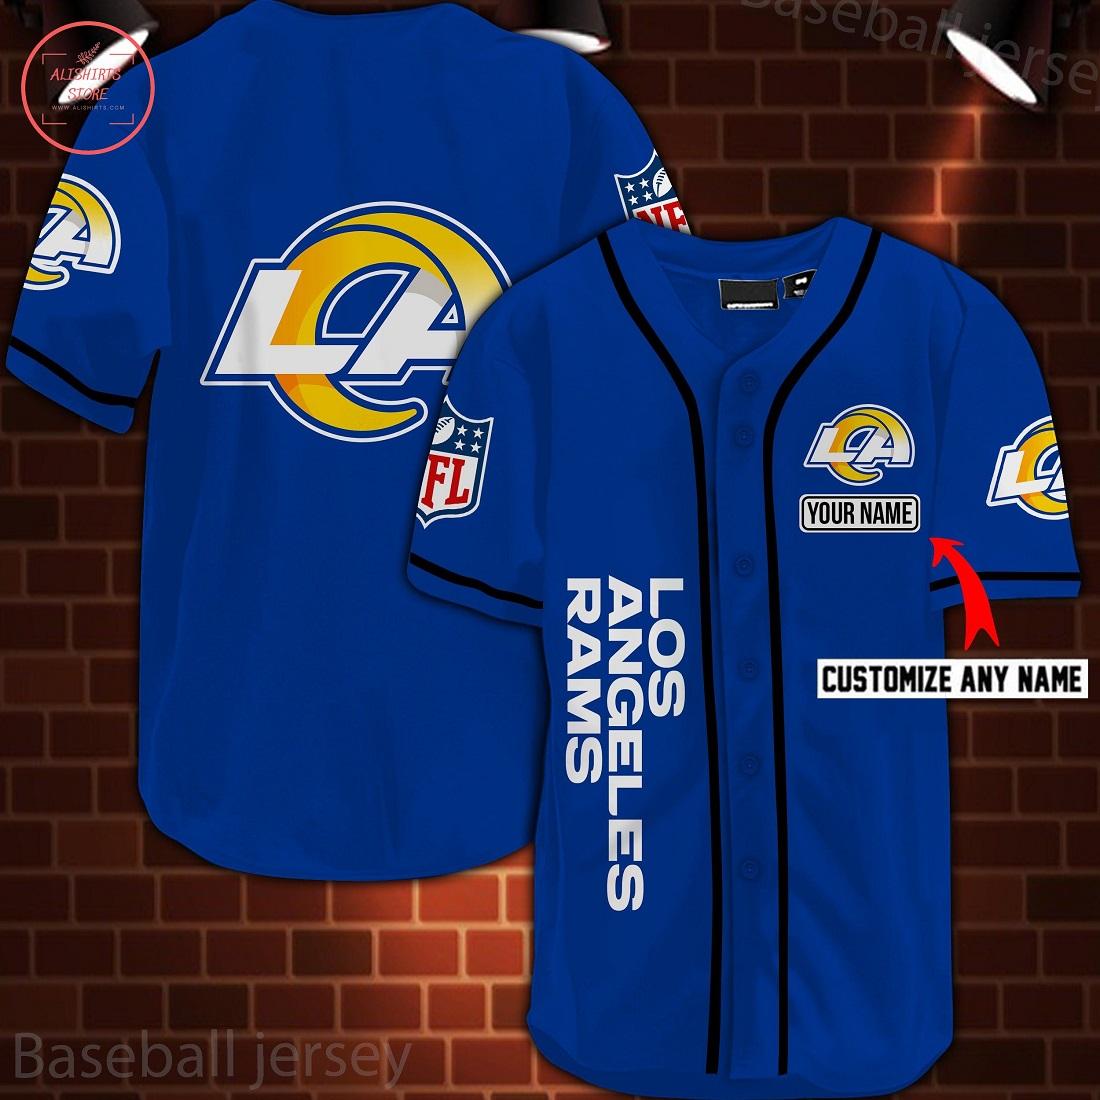 Los Angeles Rams Personalized Custom Baseball Jersey